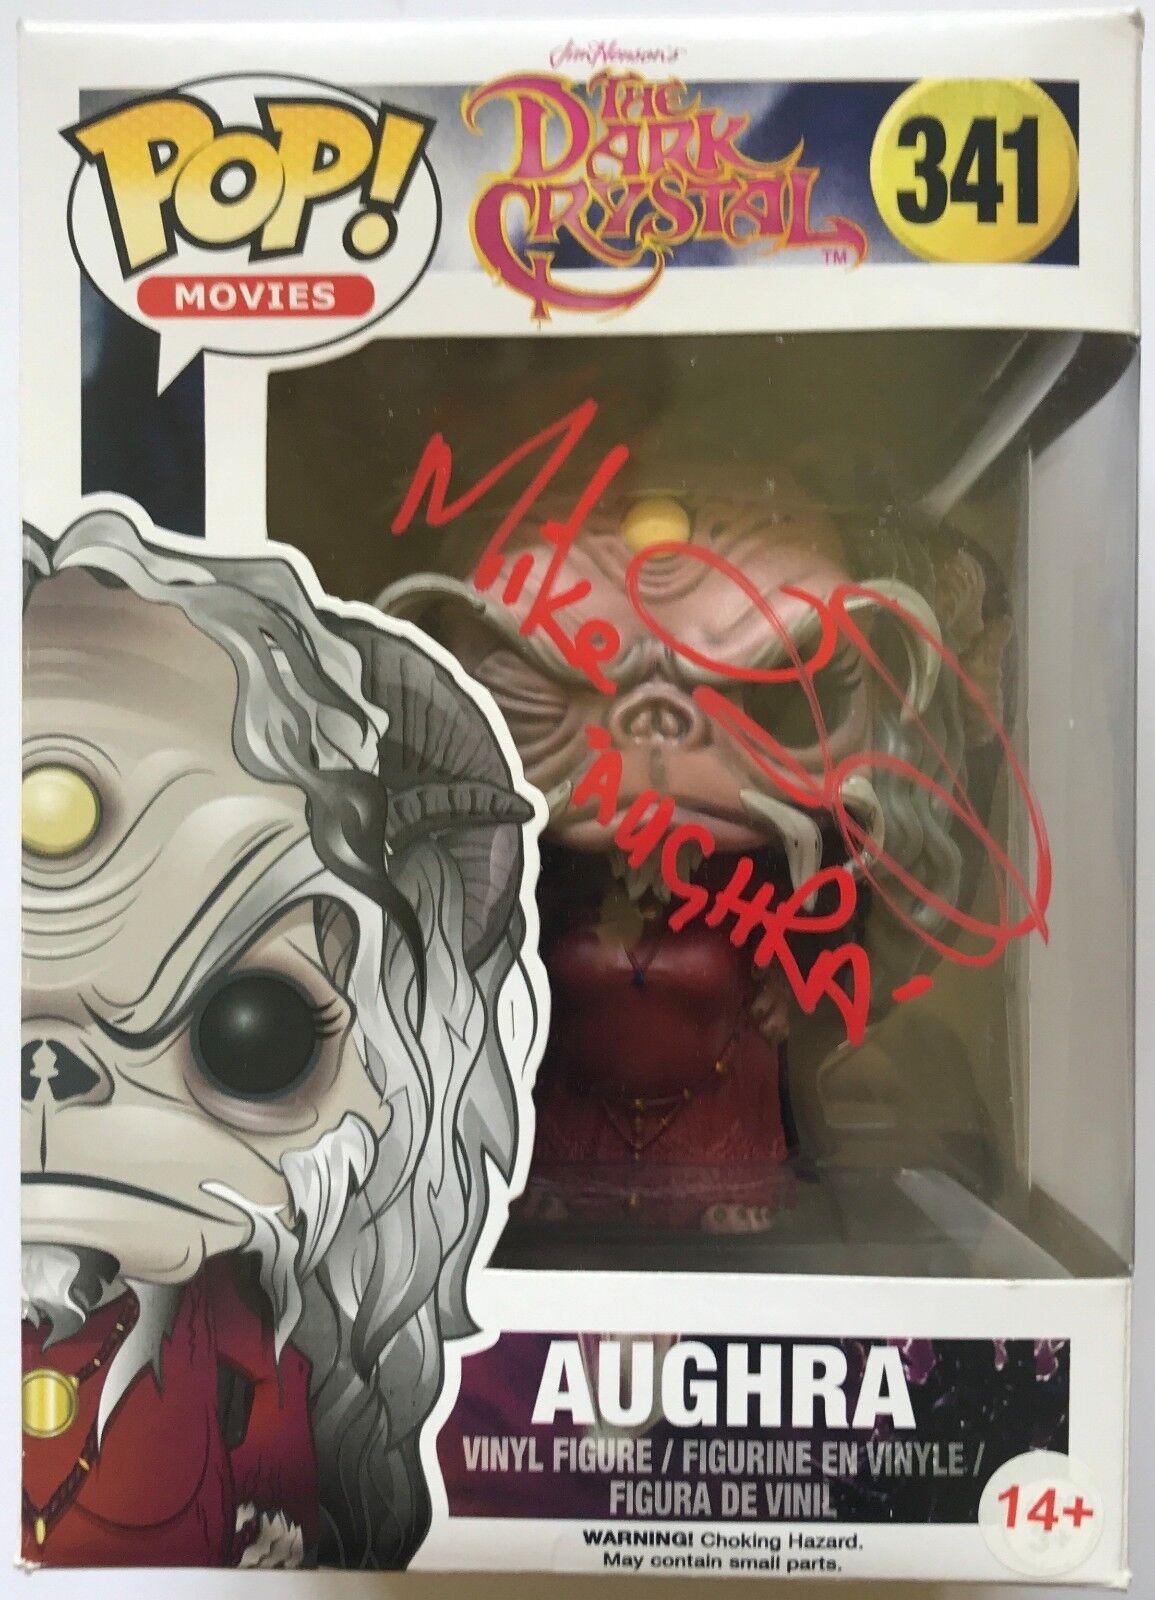 Mike Edmonds mano firmado aughra  Funko Pop  341.